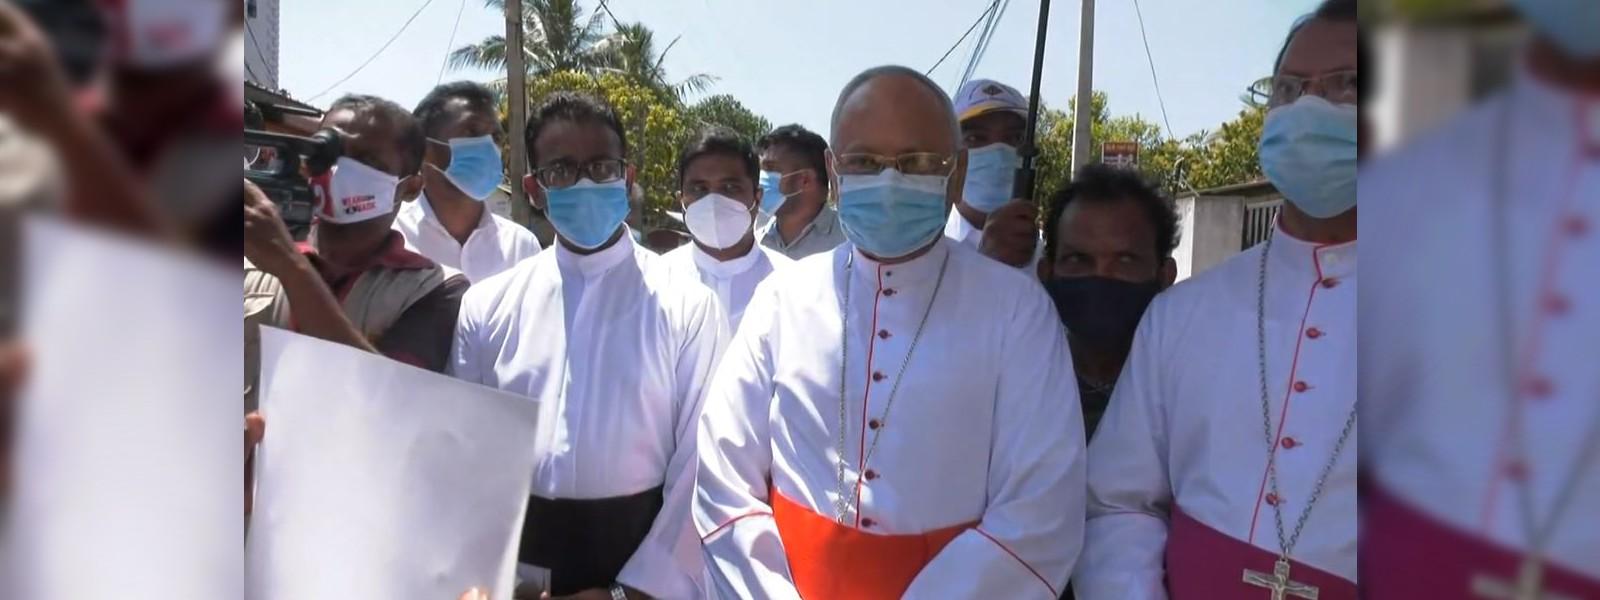 His Eminence Malcolm Cardinal Ranjith visits Katuwapitiya to support silent protest